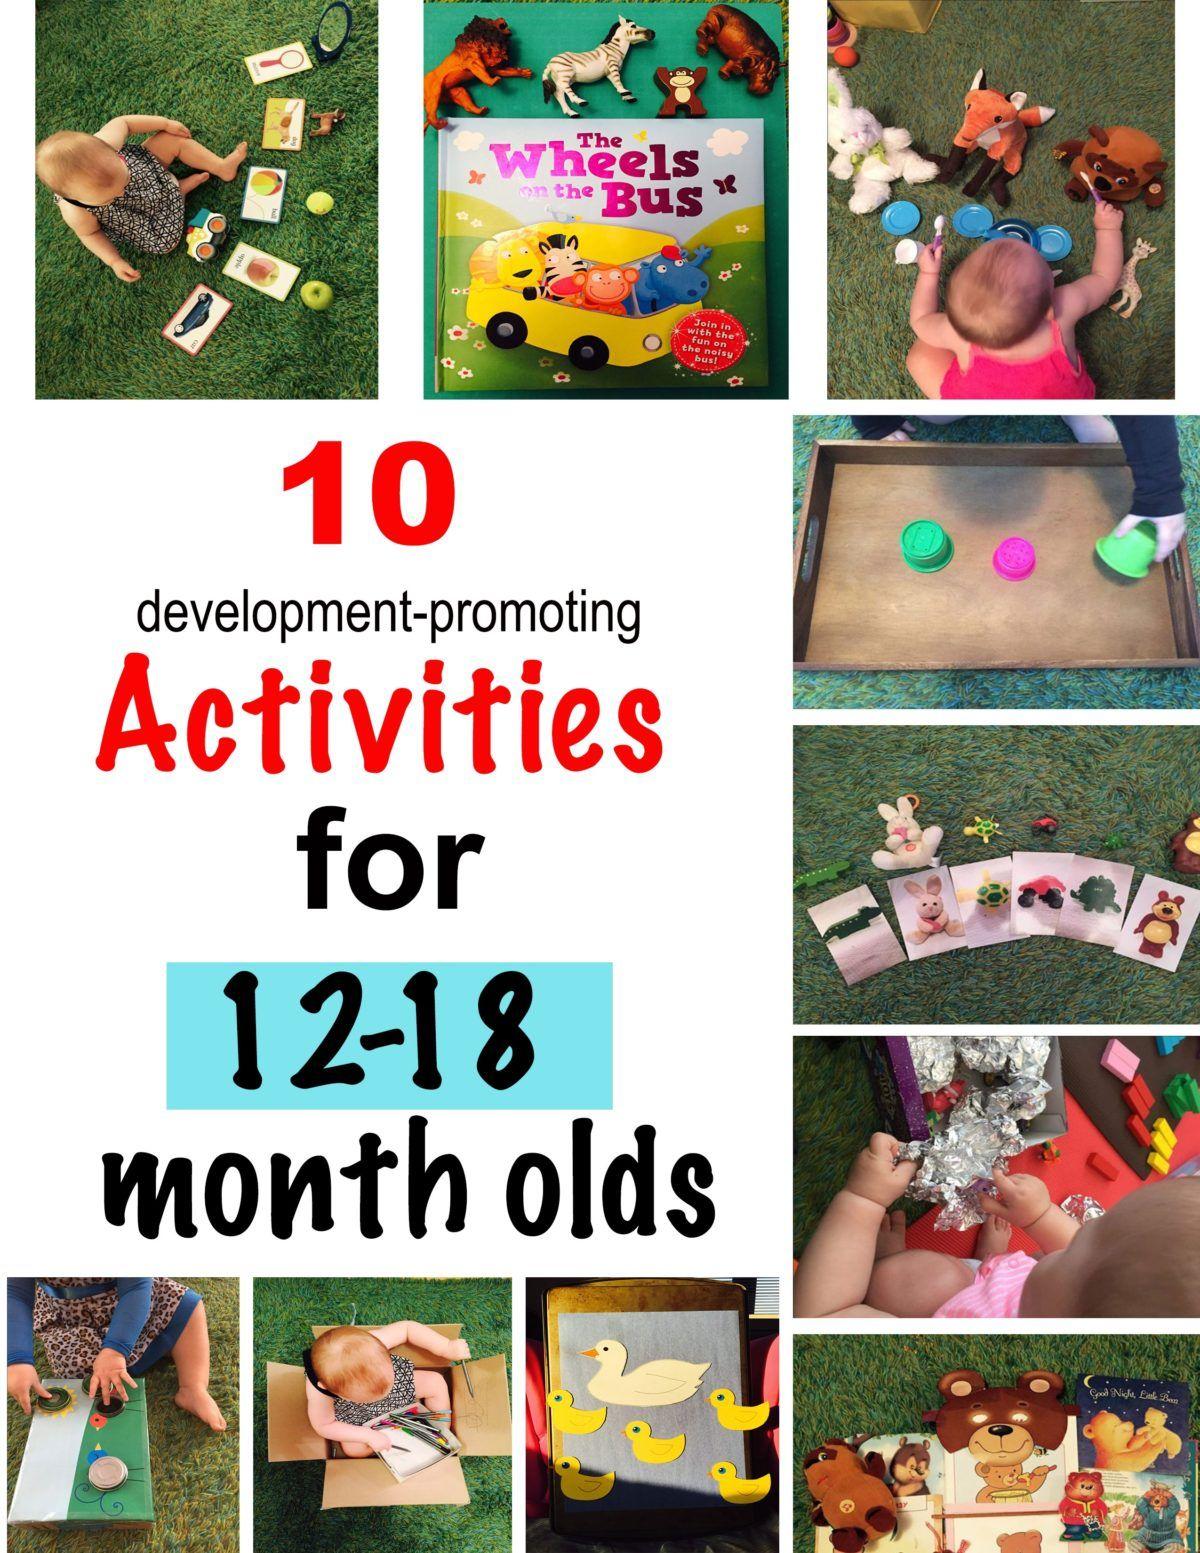 10 development promoting activities for 12-18 month olds, activities for  one year old, activities for 12 month old, activities for 13 month old, ...